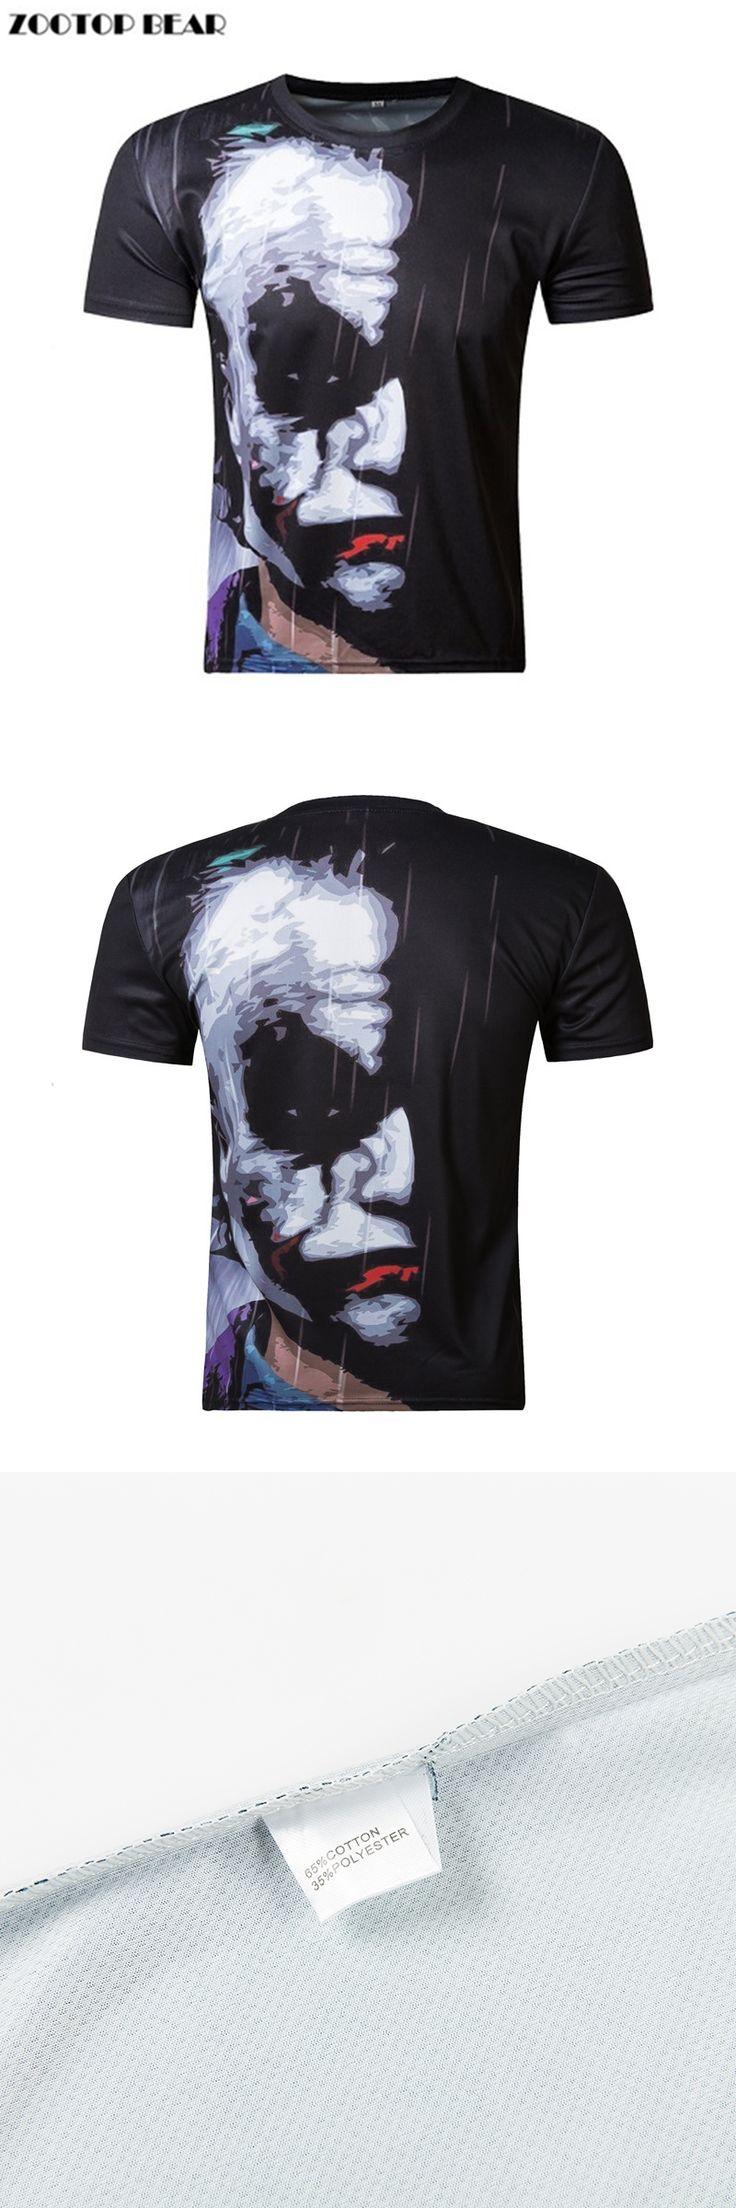 2017 New half face Joker 3d Fashion funny character joker Brand clothing design 3d t-shirt summer style tees top print Skull